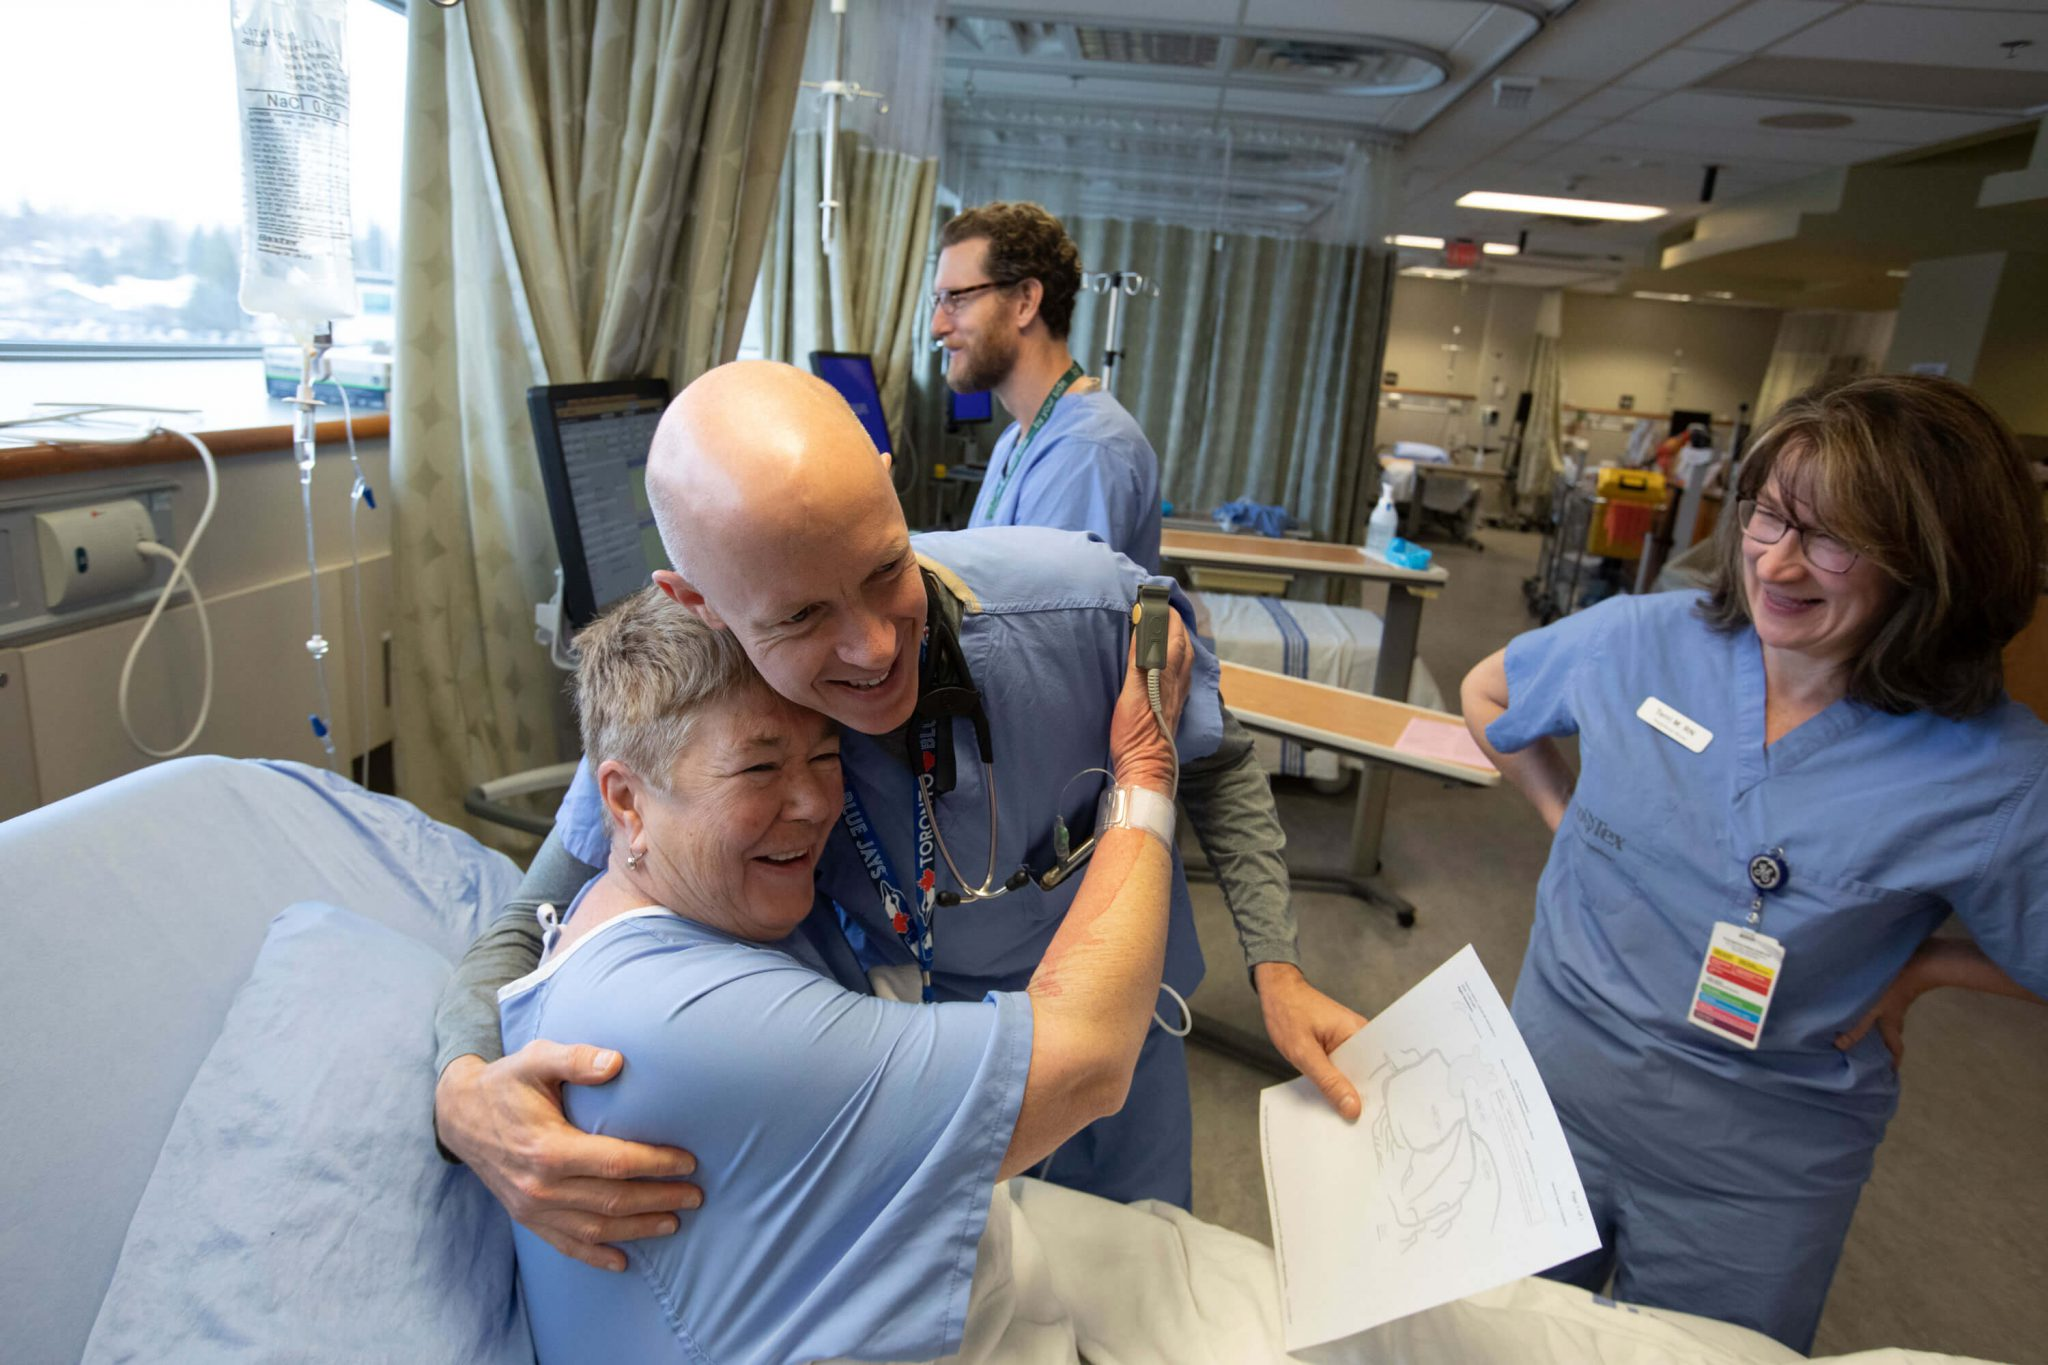 Cardiac doctor hugging patient at bedside